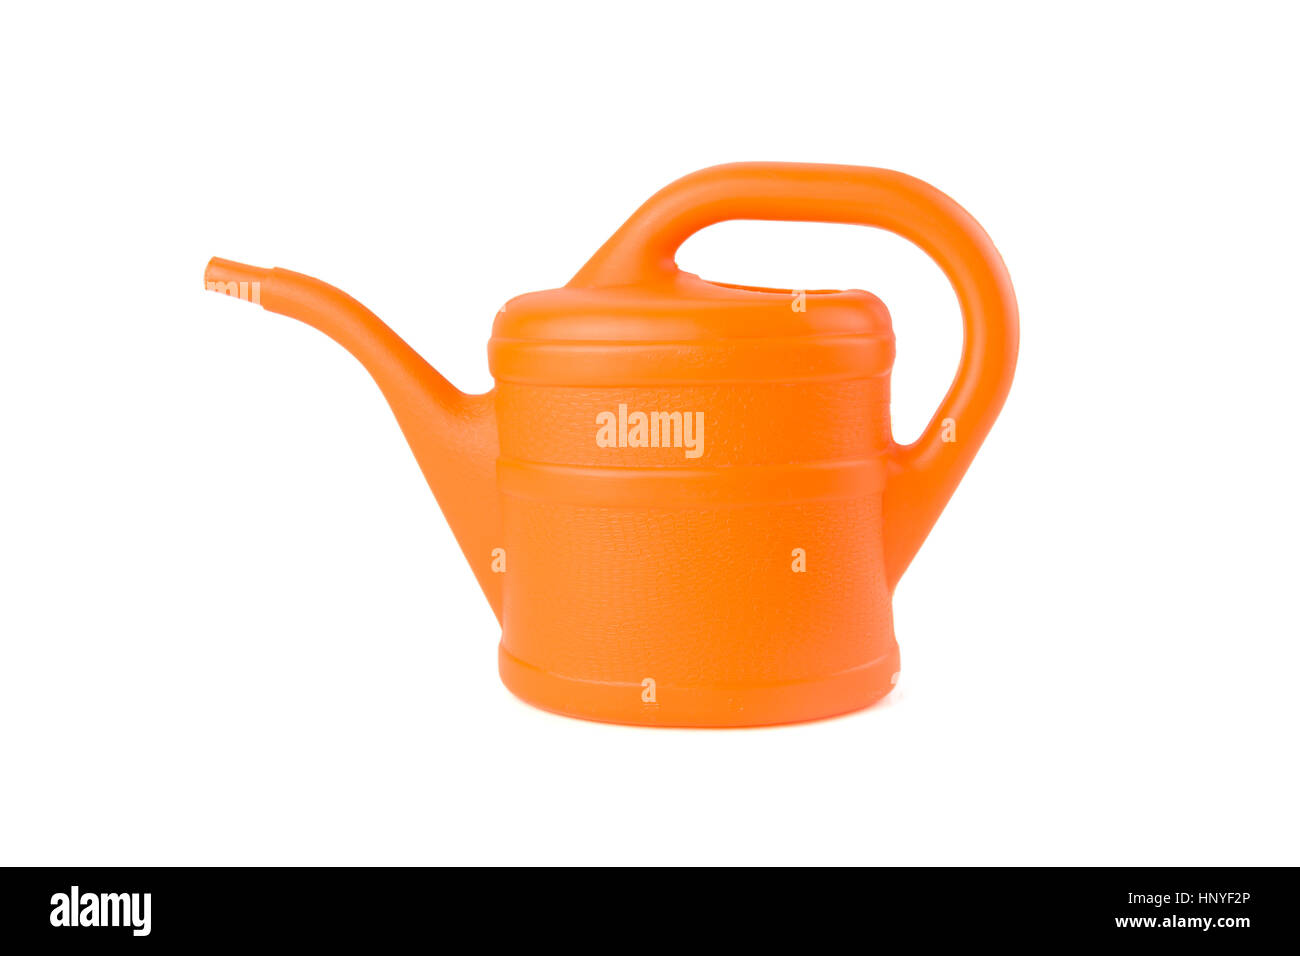 orange watering can on white background studio shot - Stock Image